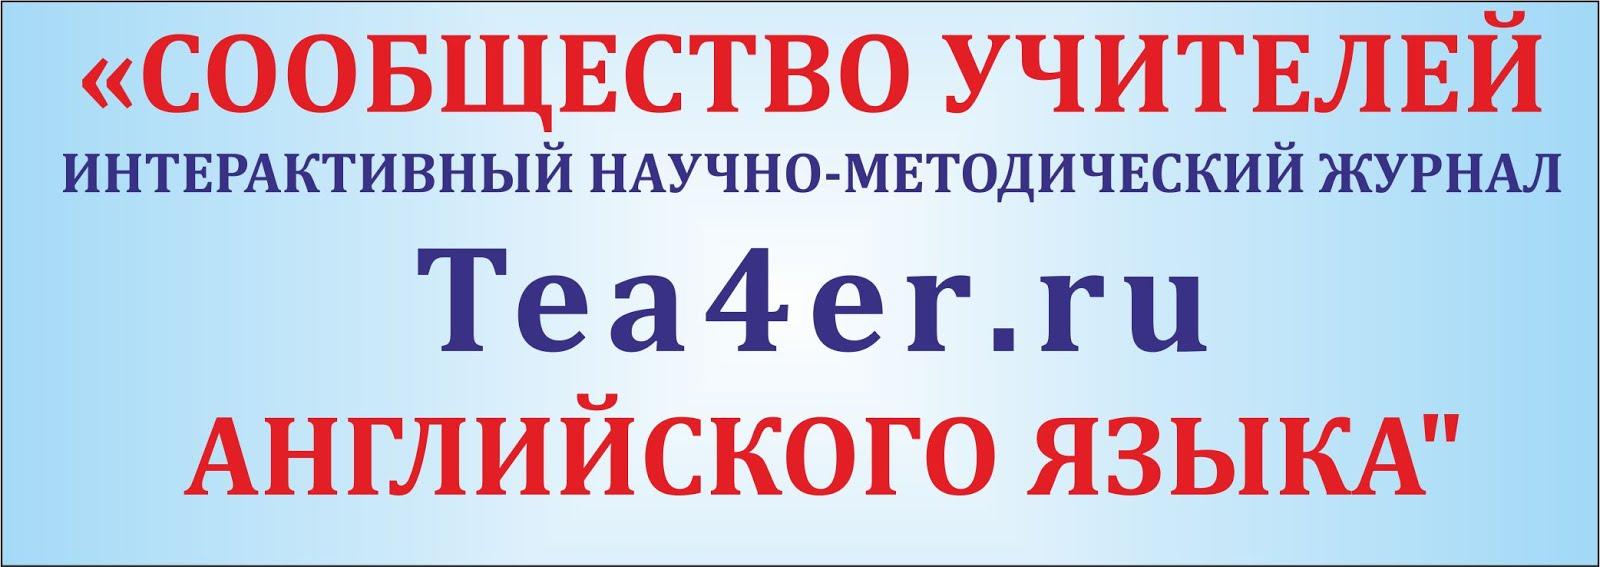 Tea4cher.ru